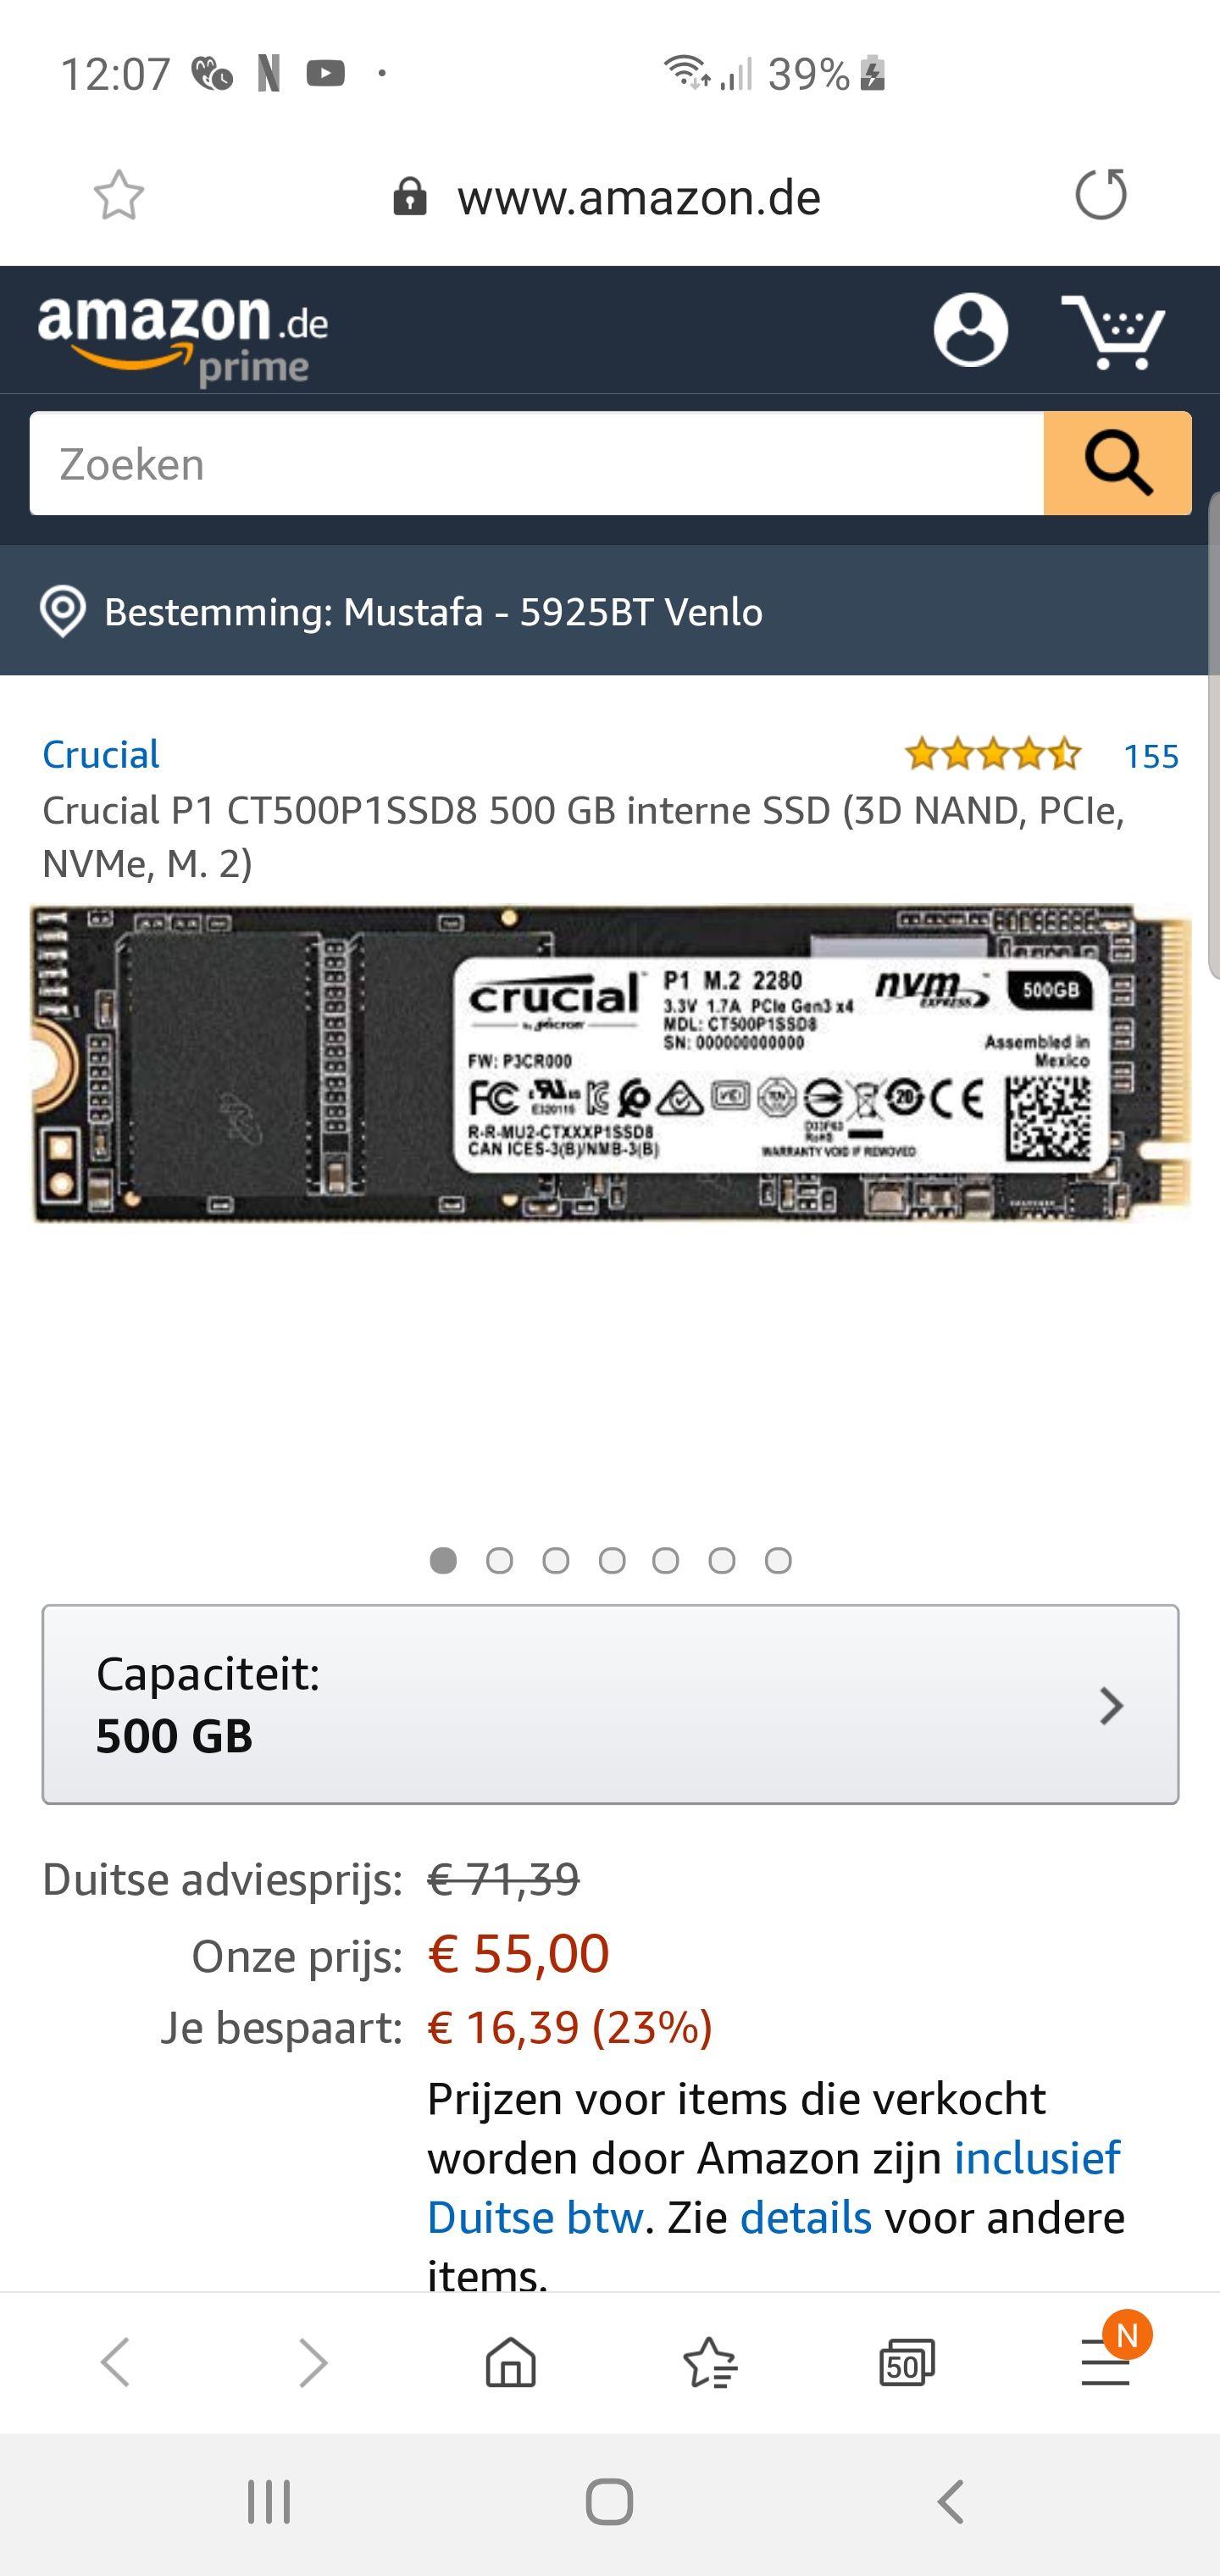 Crucial P1 CT500P1SSD8 500 GB interne SSD (3D NAND, PCIe, NVMe, M. 2)  €55,- @Amazon.de